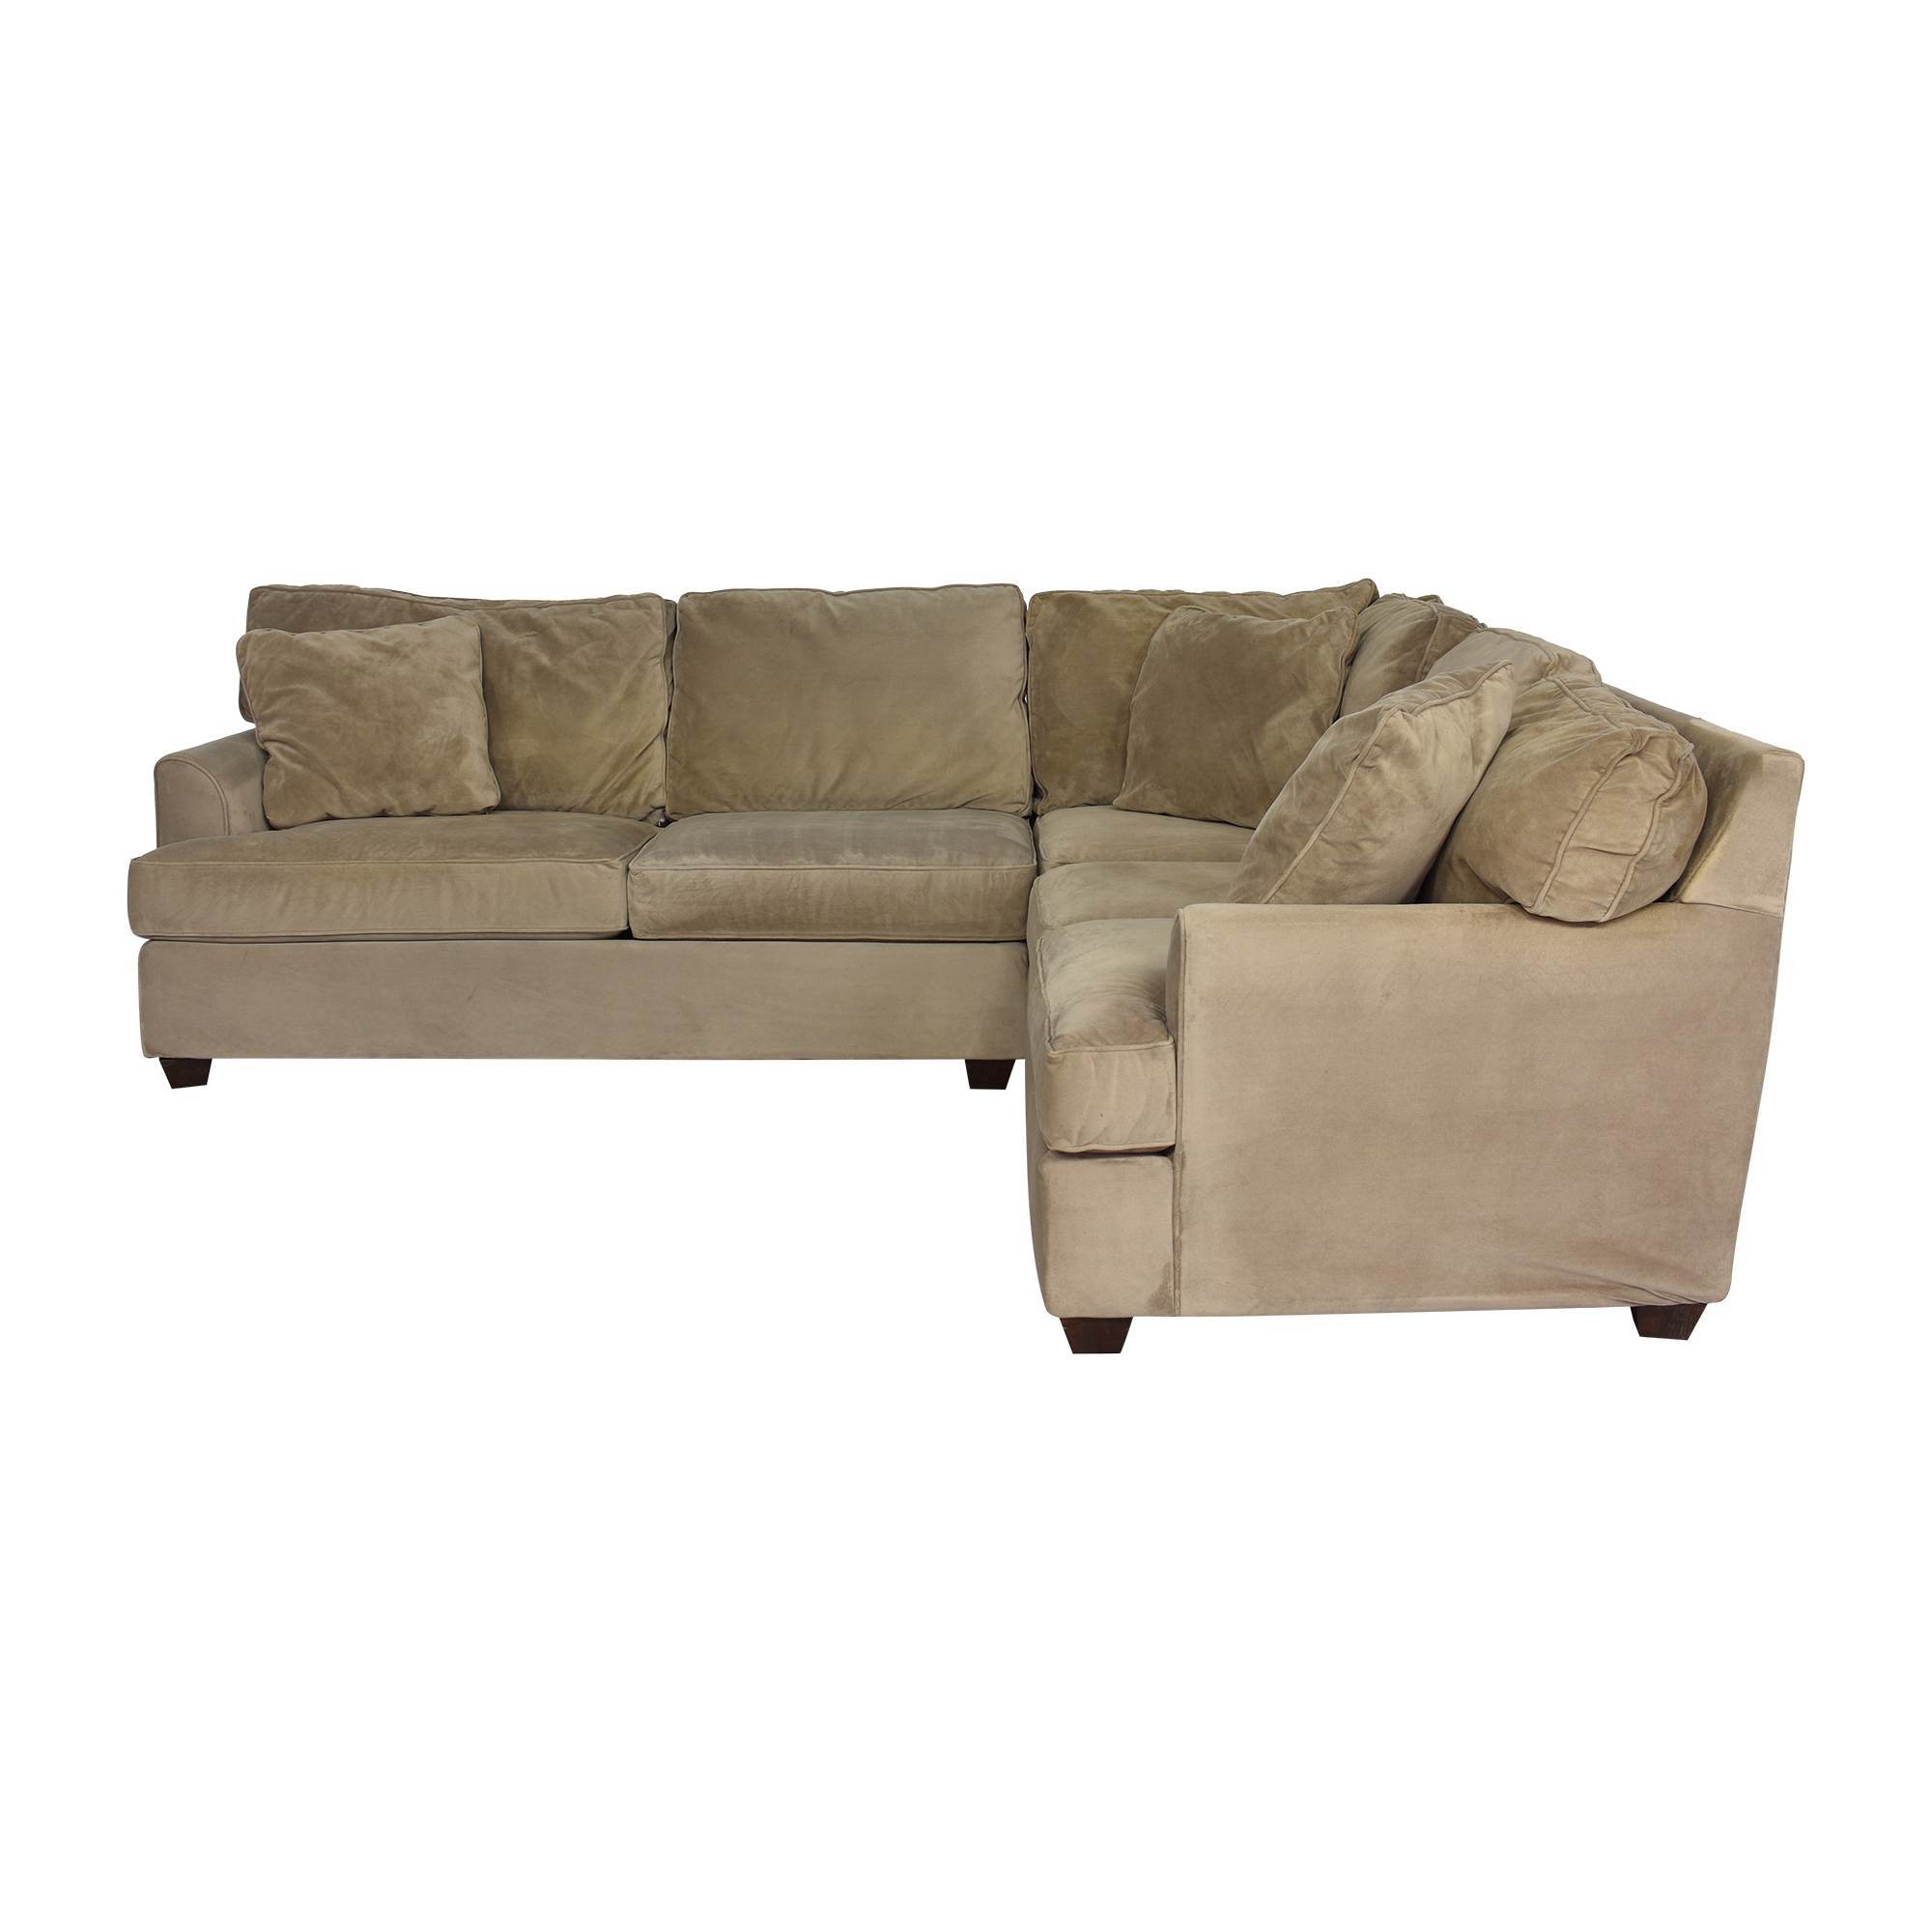 JC Penney Corner Sectional Sofa sale